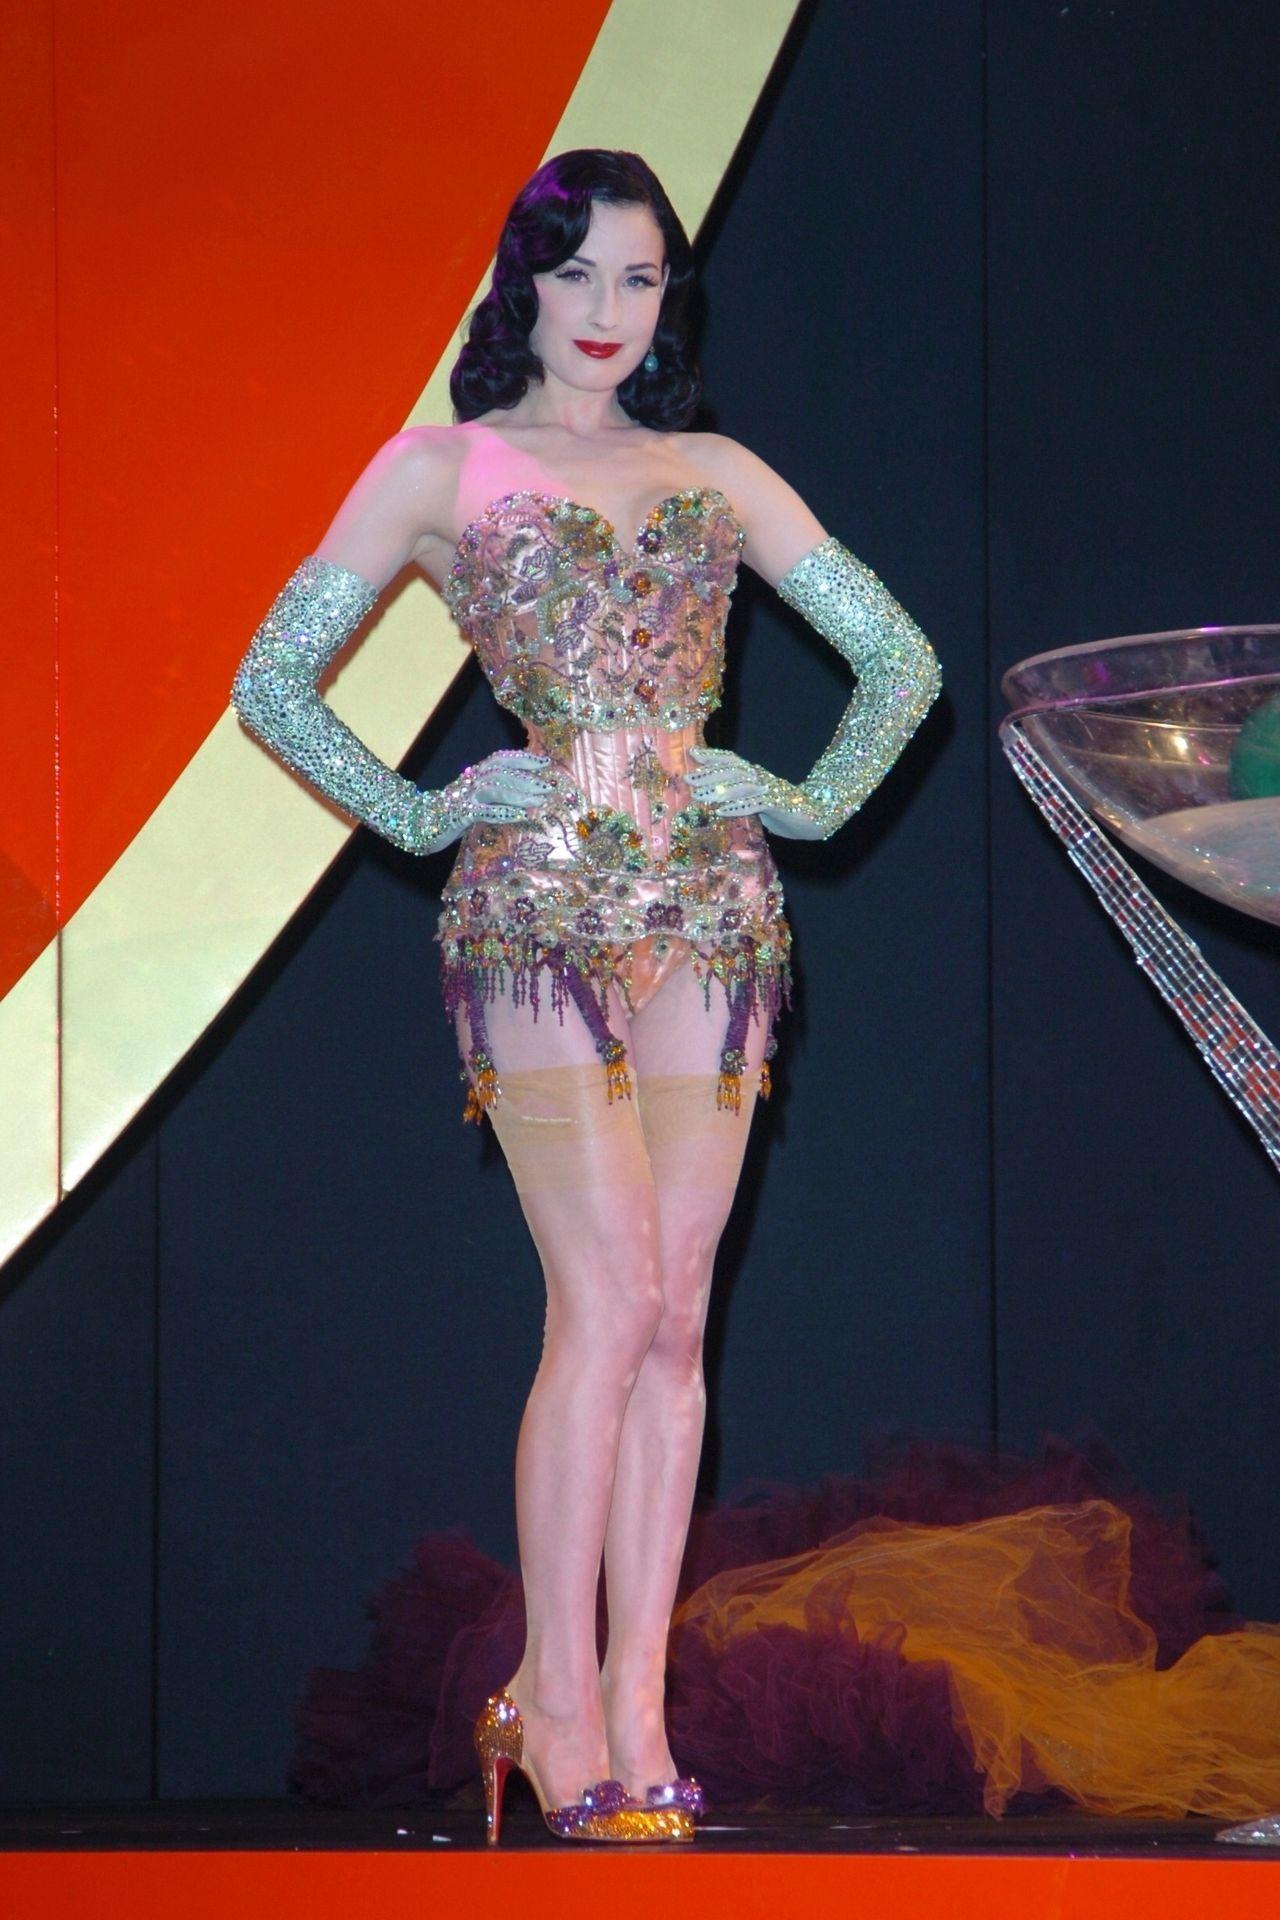 Dita Von Teese Performs At Erotica 06 In London 0019